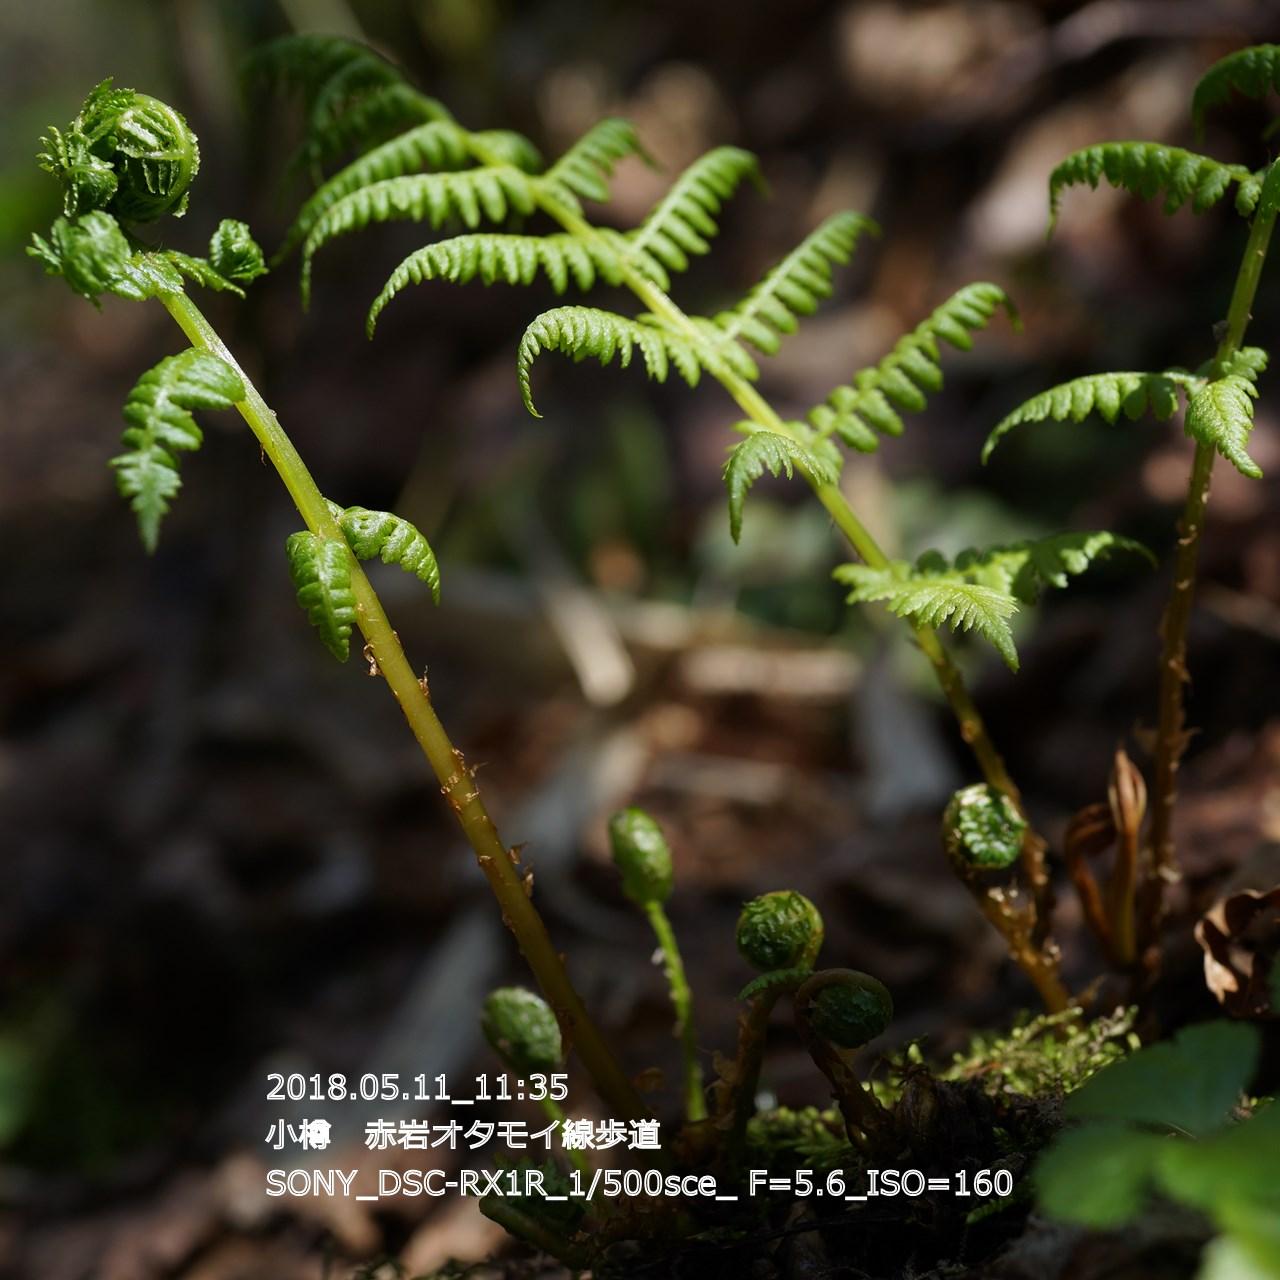 2018/05/11_19:45:18  DSC05311.jpg